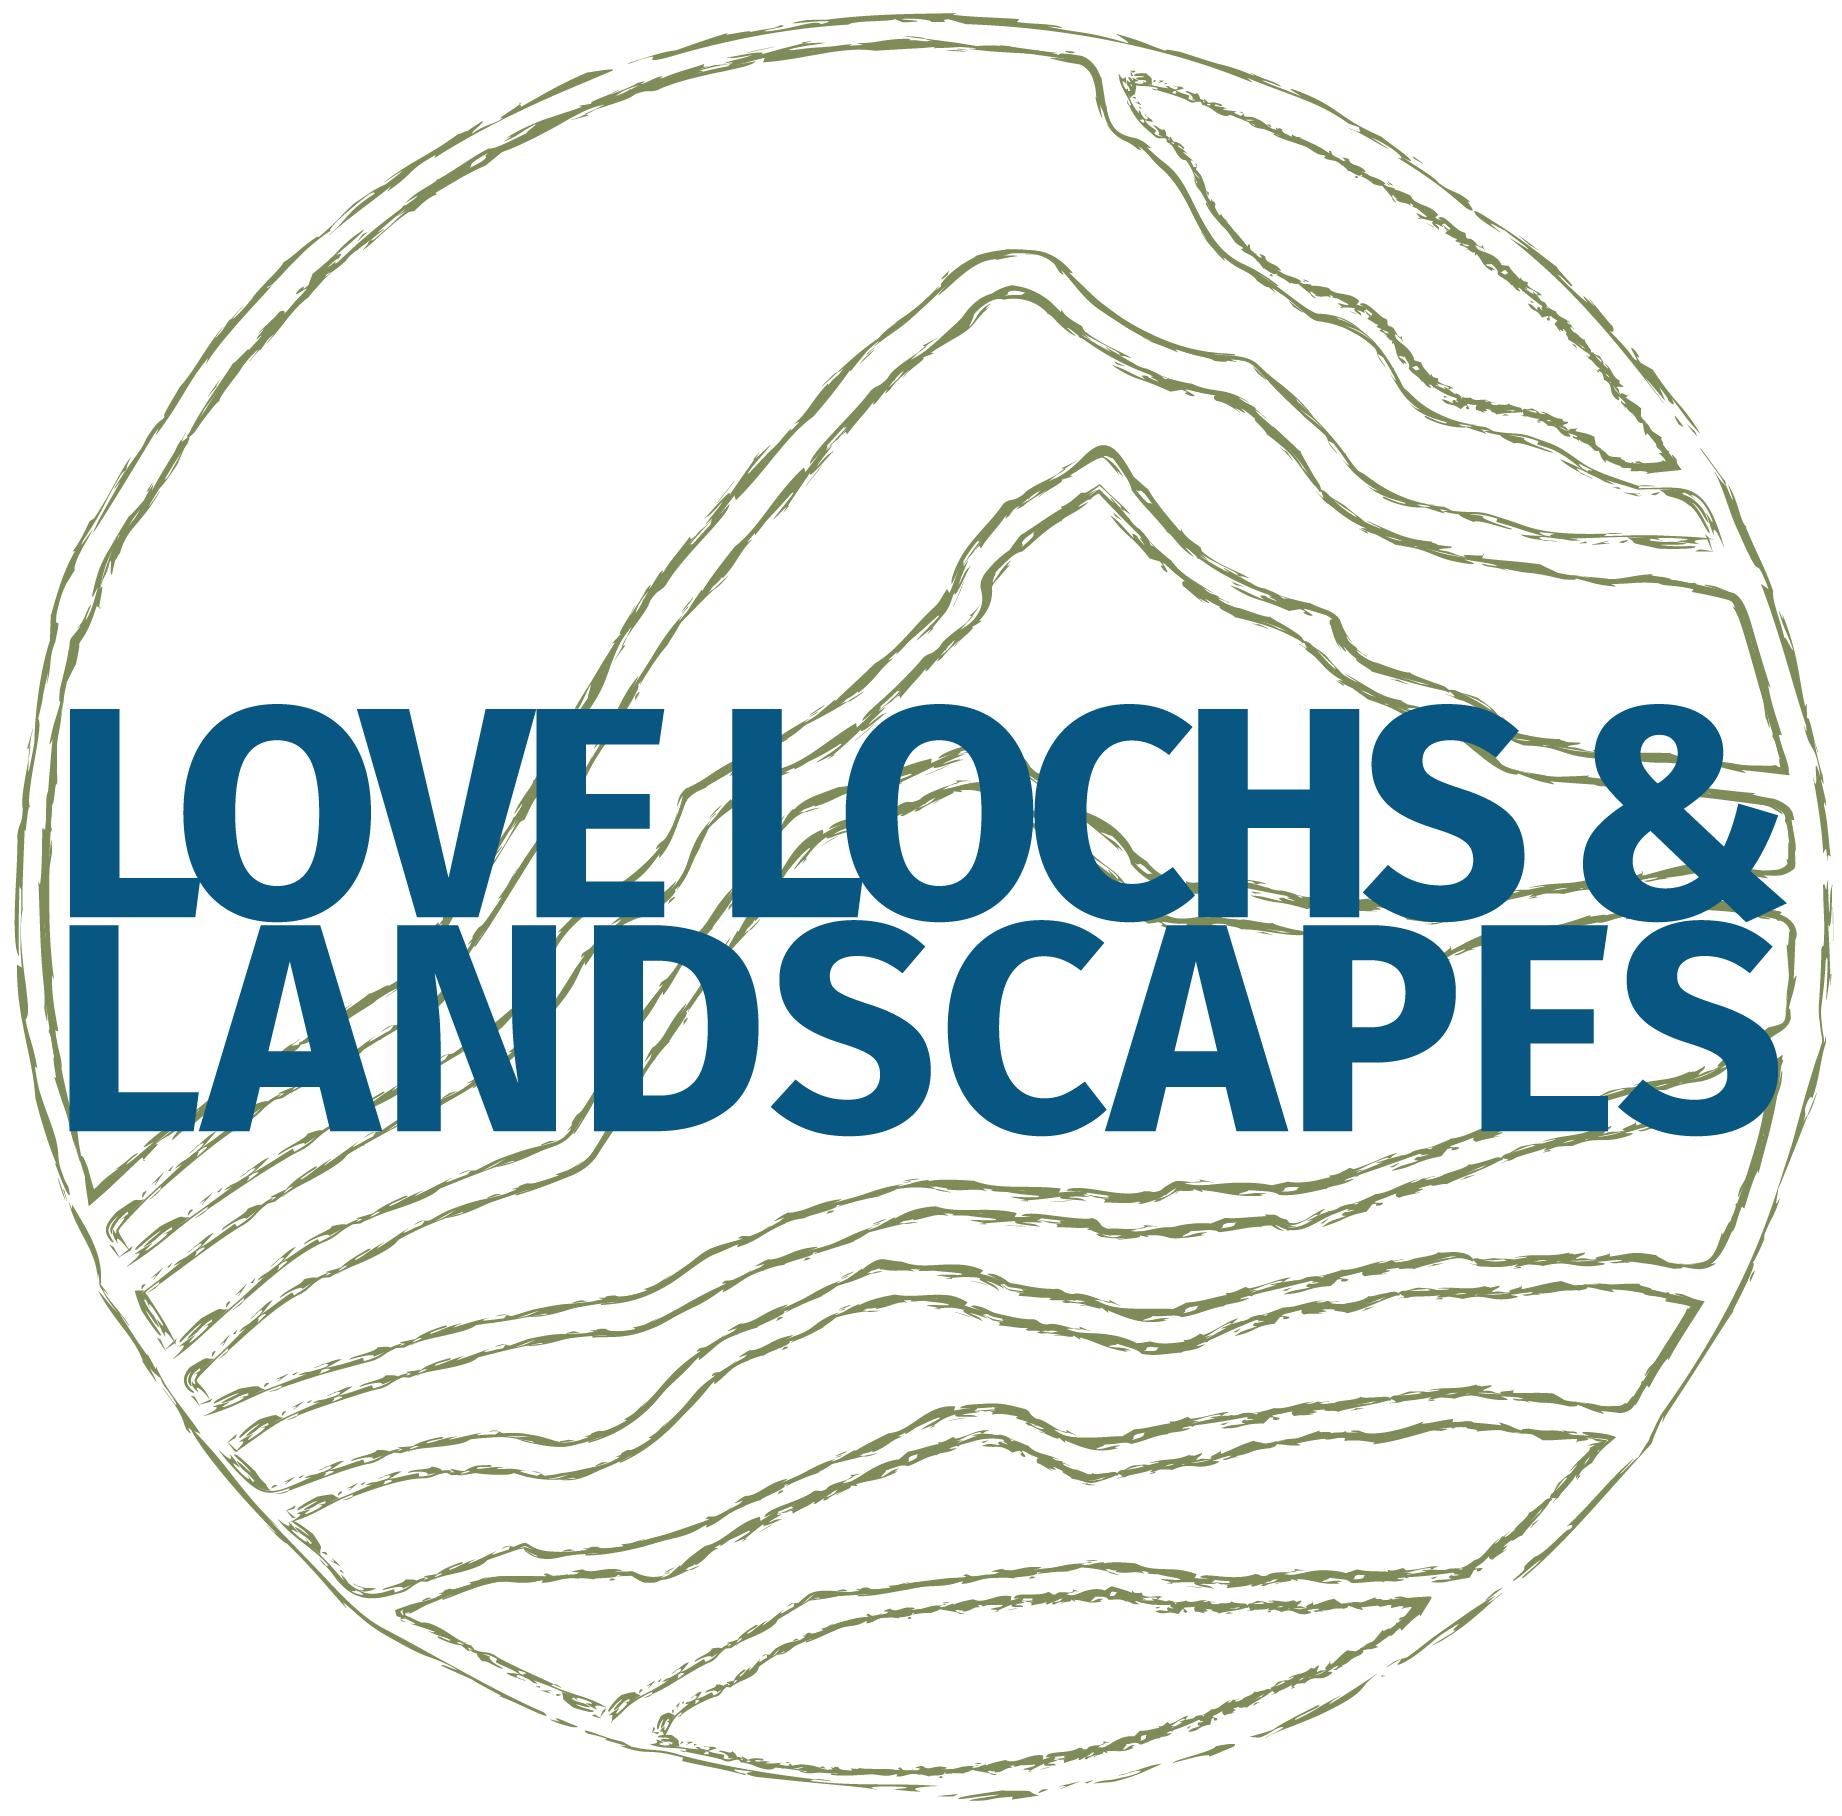 Love Lochs & Landscapes